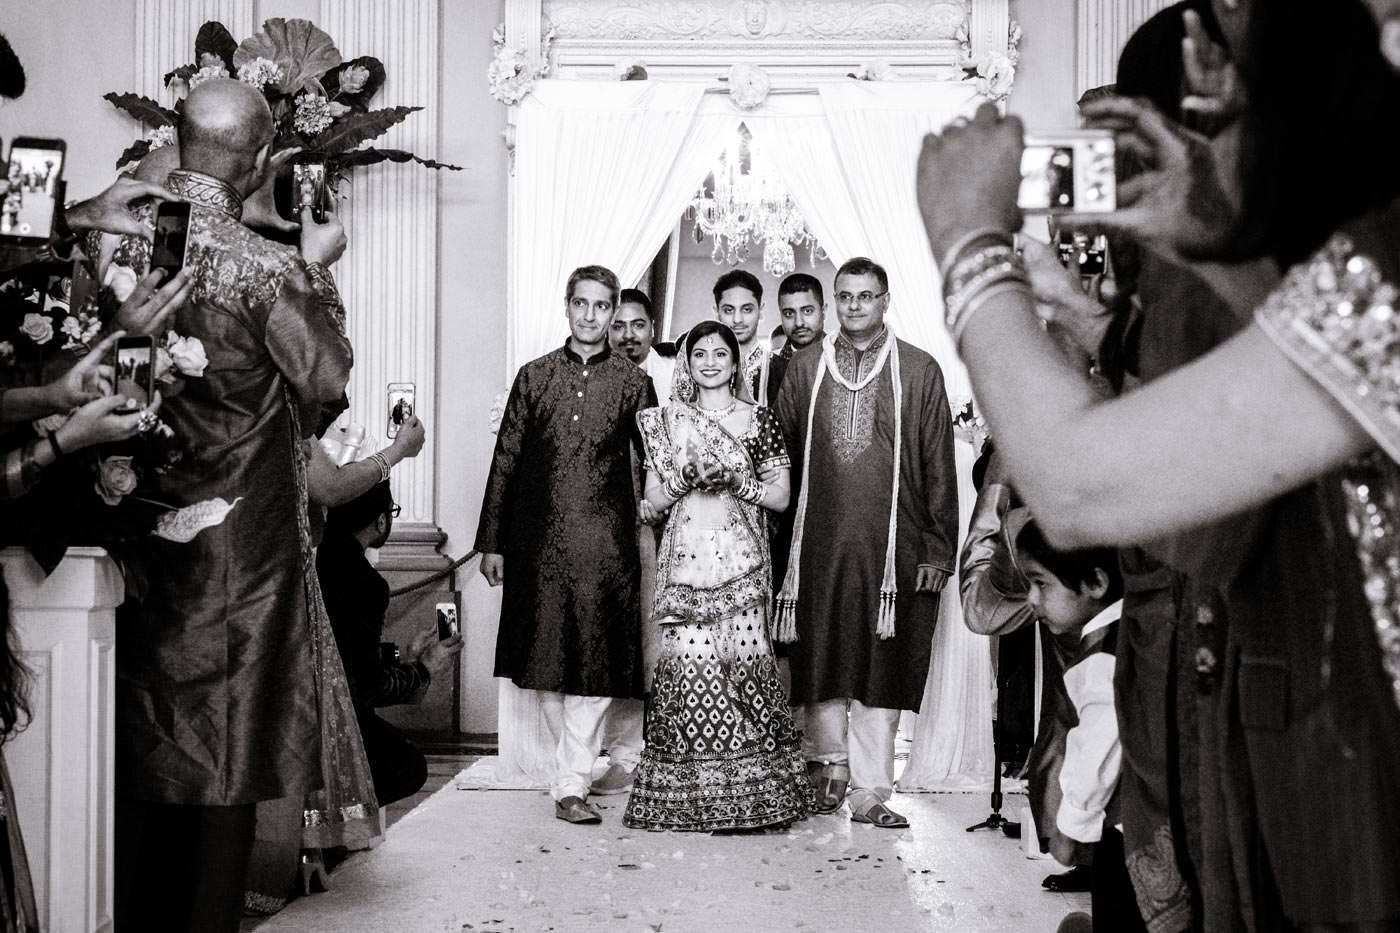 Bride's arrival for the Hindu wedding celebration at Ragley Hall